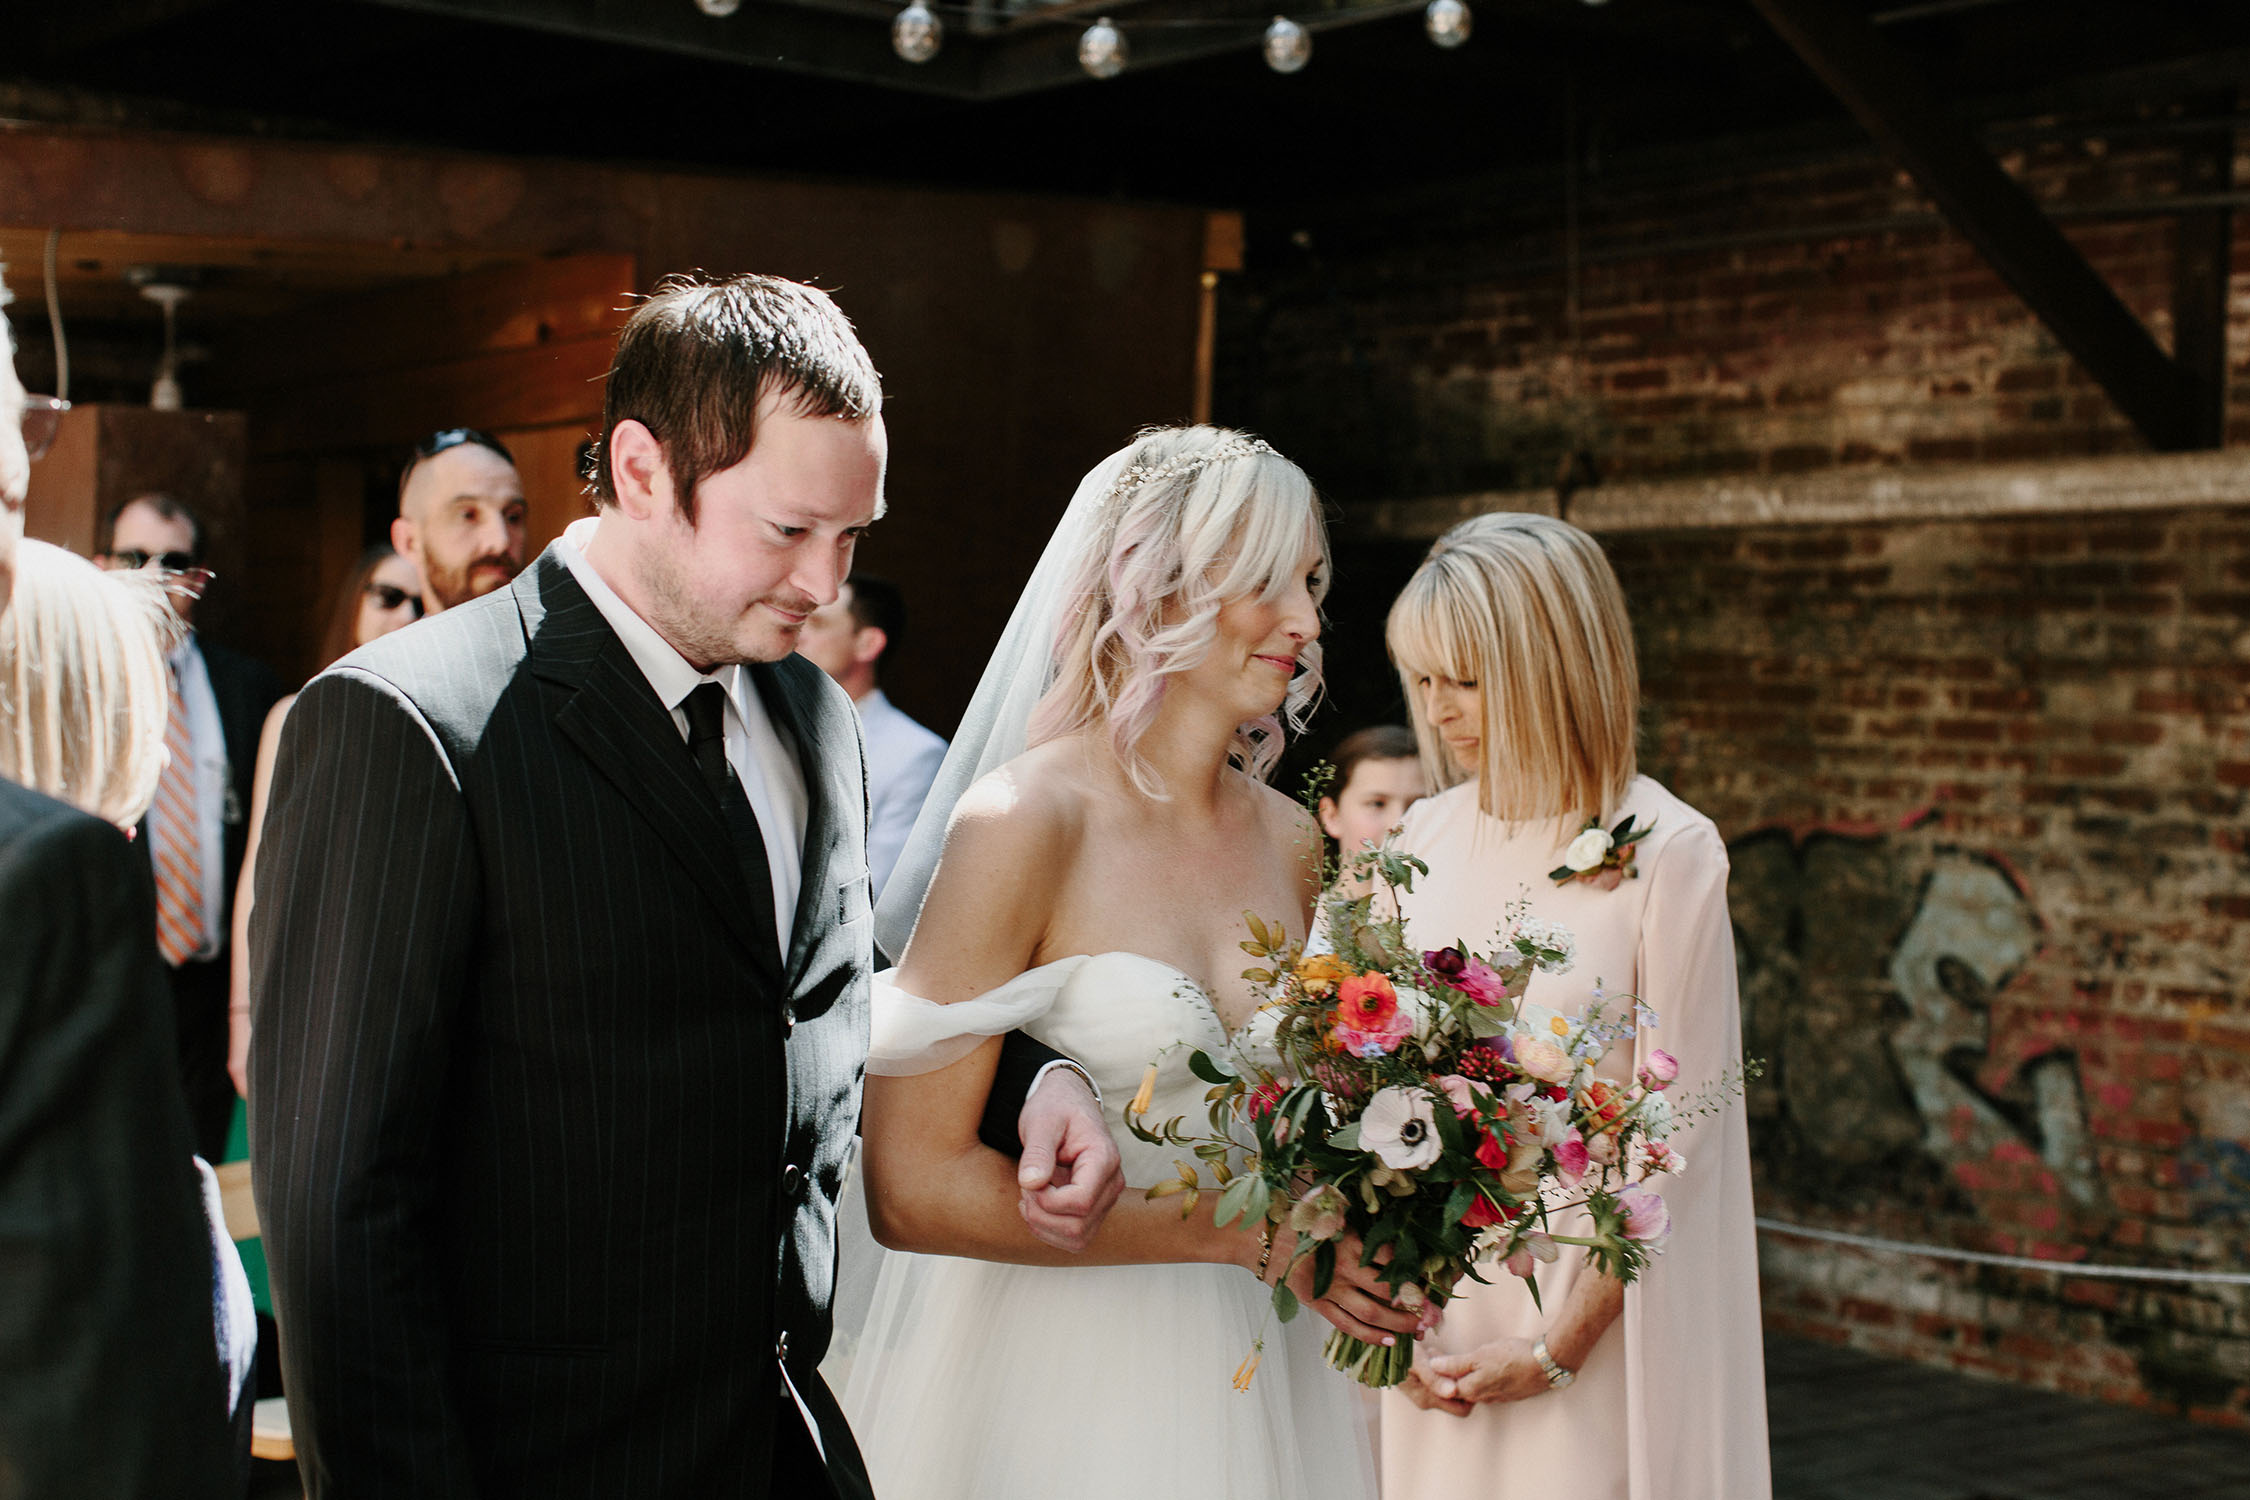 nontraditional-athens-georgia-wedding-photographer (71 of 102).jpg